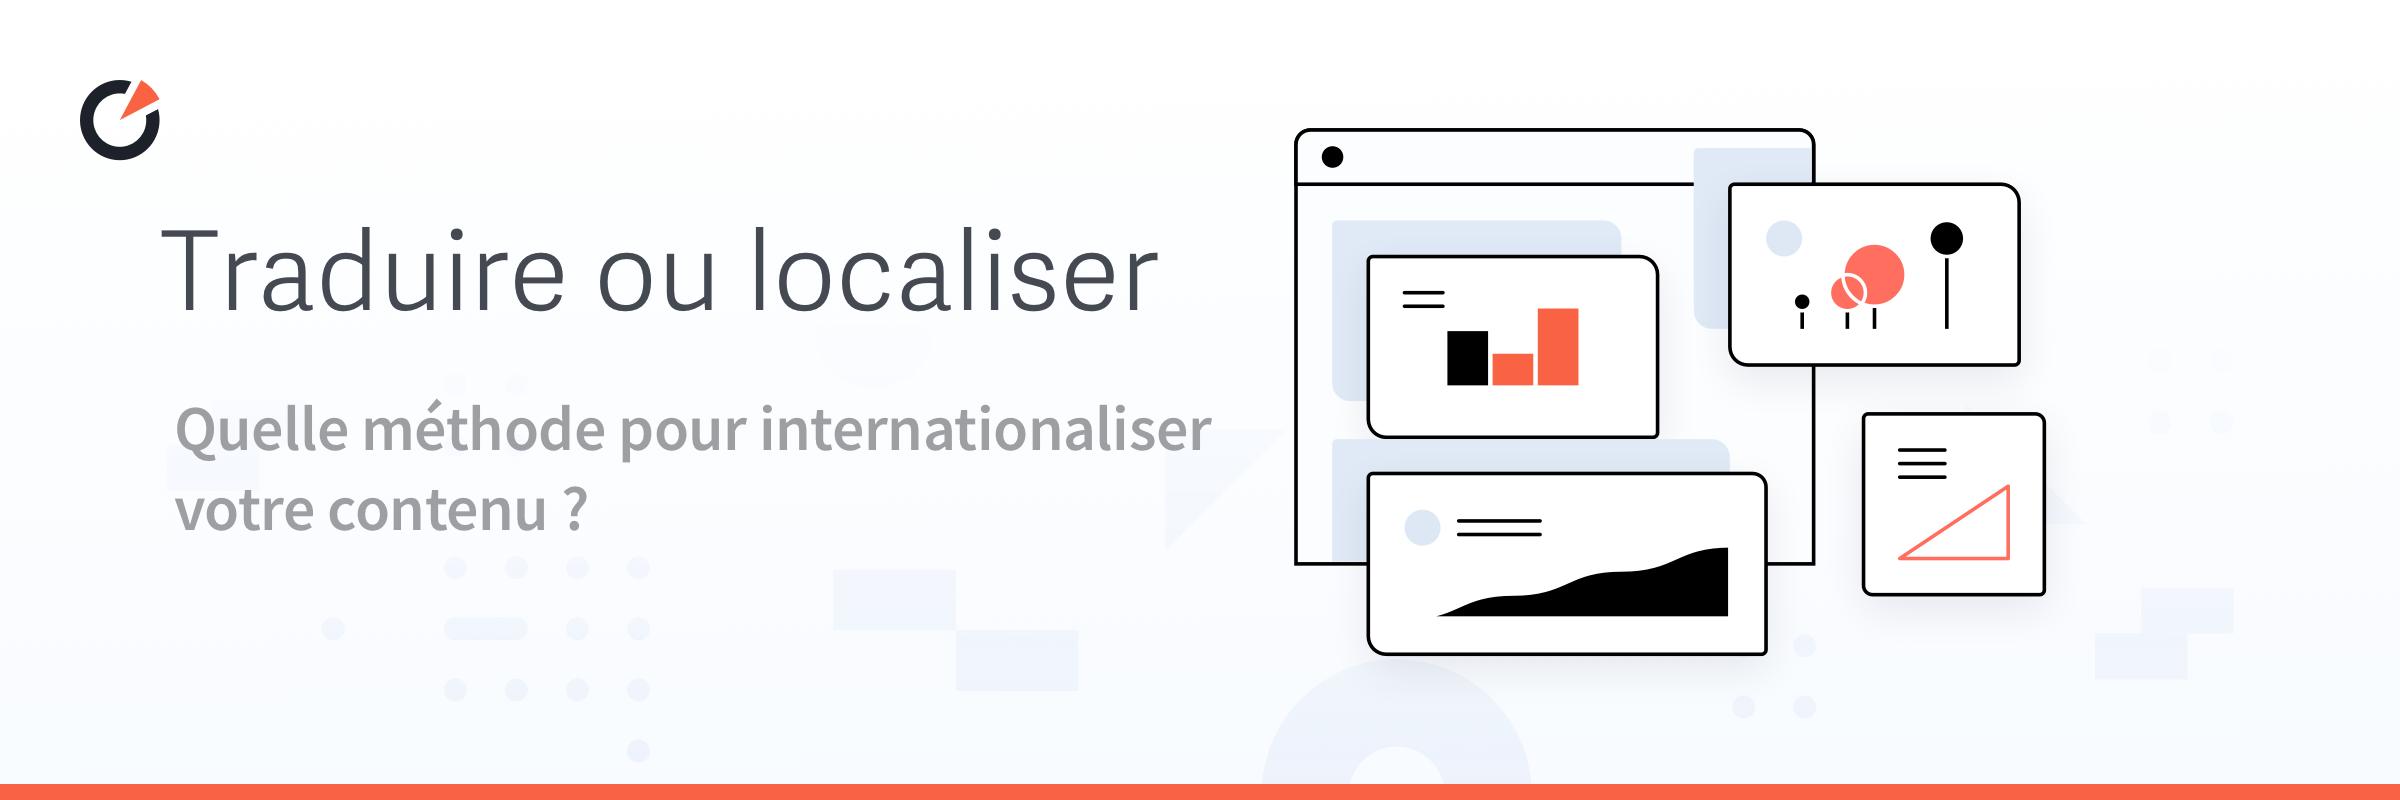 internationaliser-votre-contenu